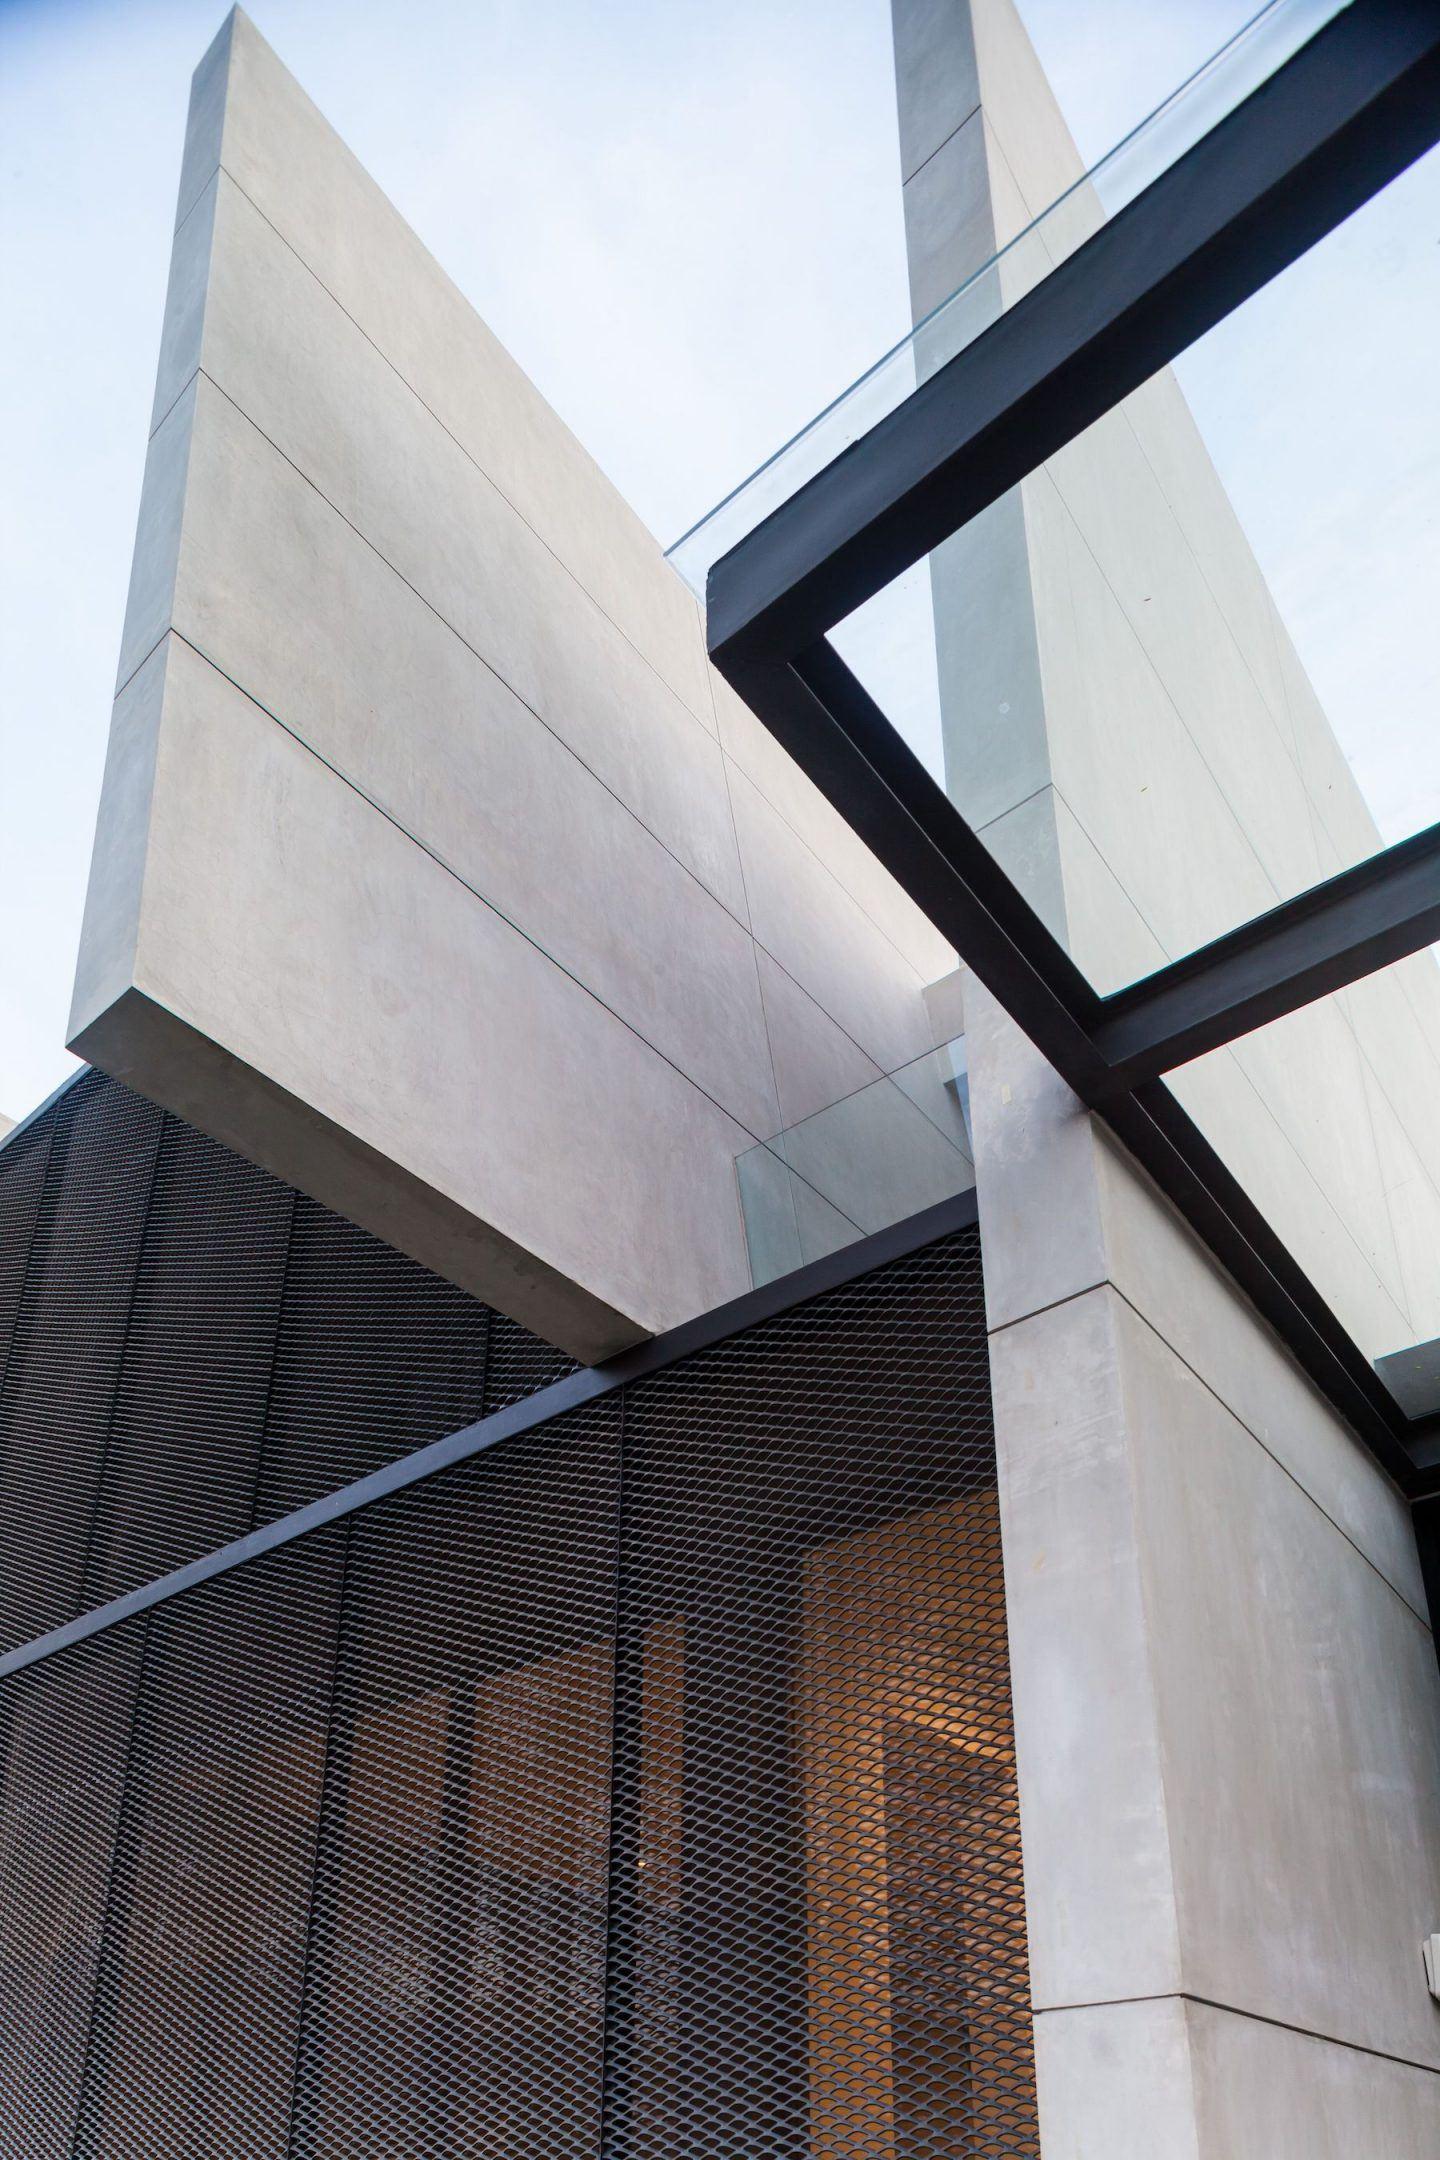 IGNANT-Architecture-Ivan-Priatman-JJ-House-03